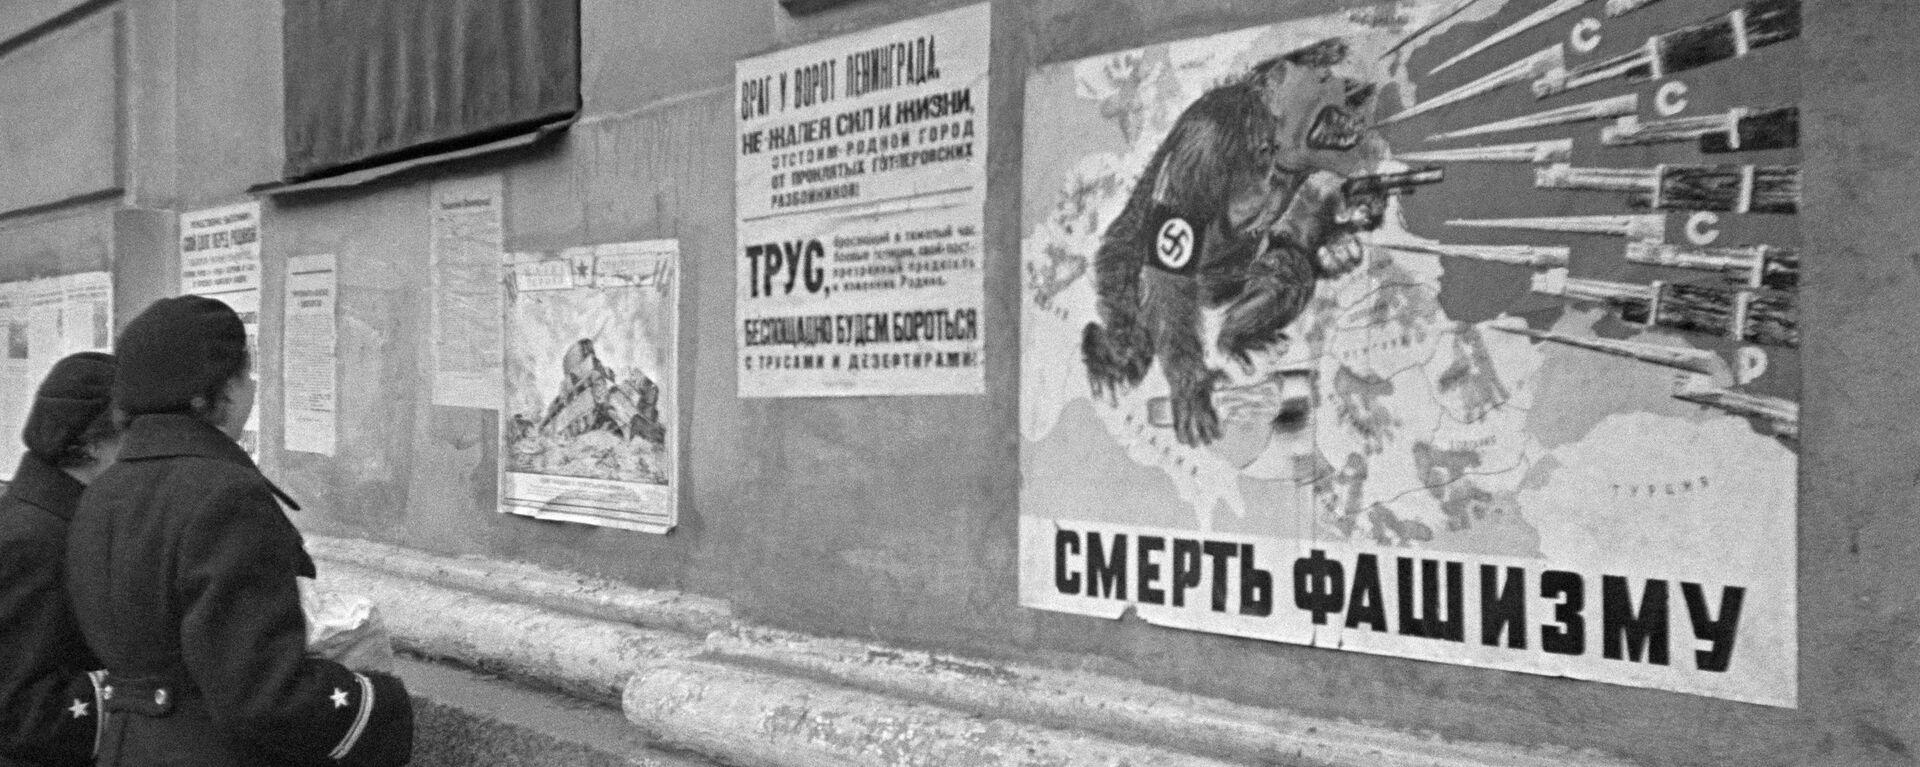 Девушки читают листовки на стене дома - Sputnik Абхазия, 1920, 17.09.2021